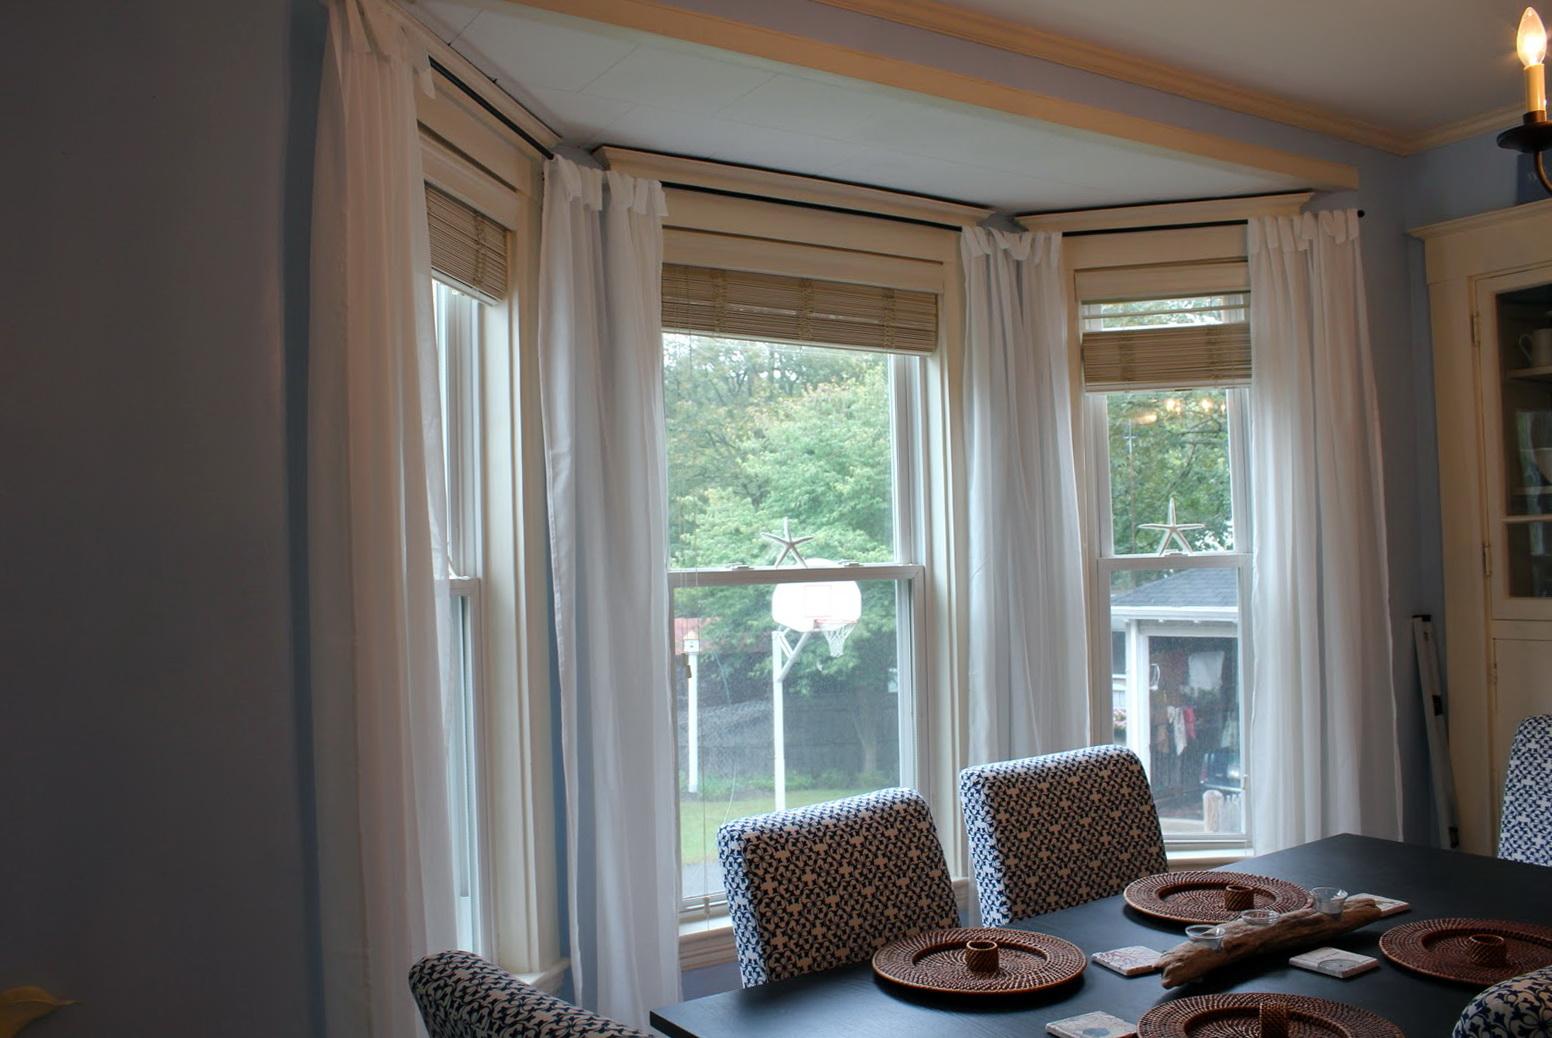 Curtain Rod For Bay Window Canada Home Design Ideas